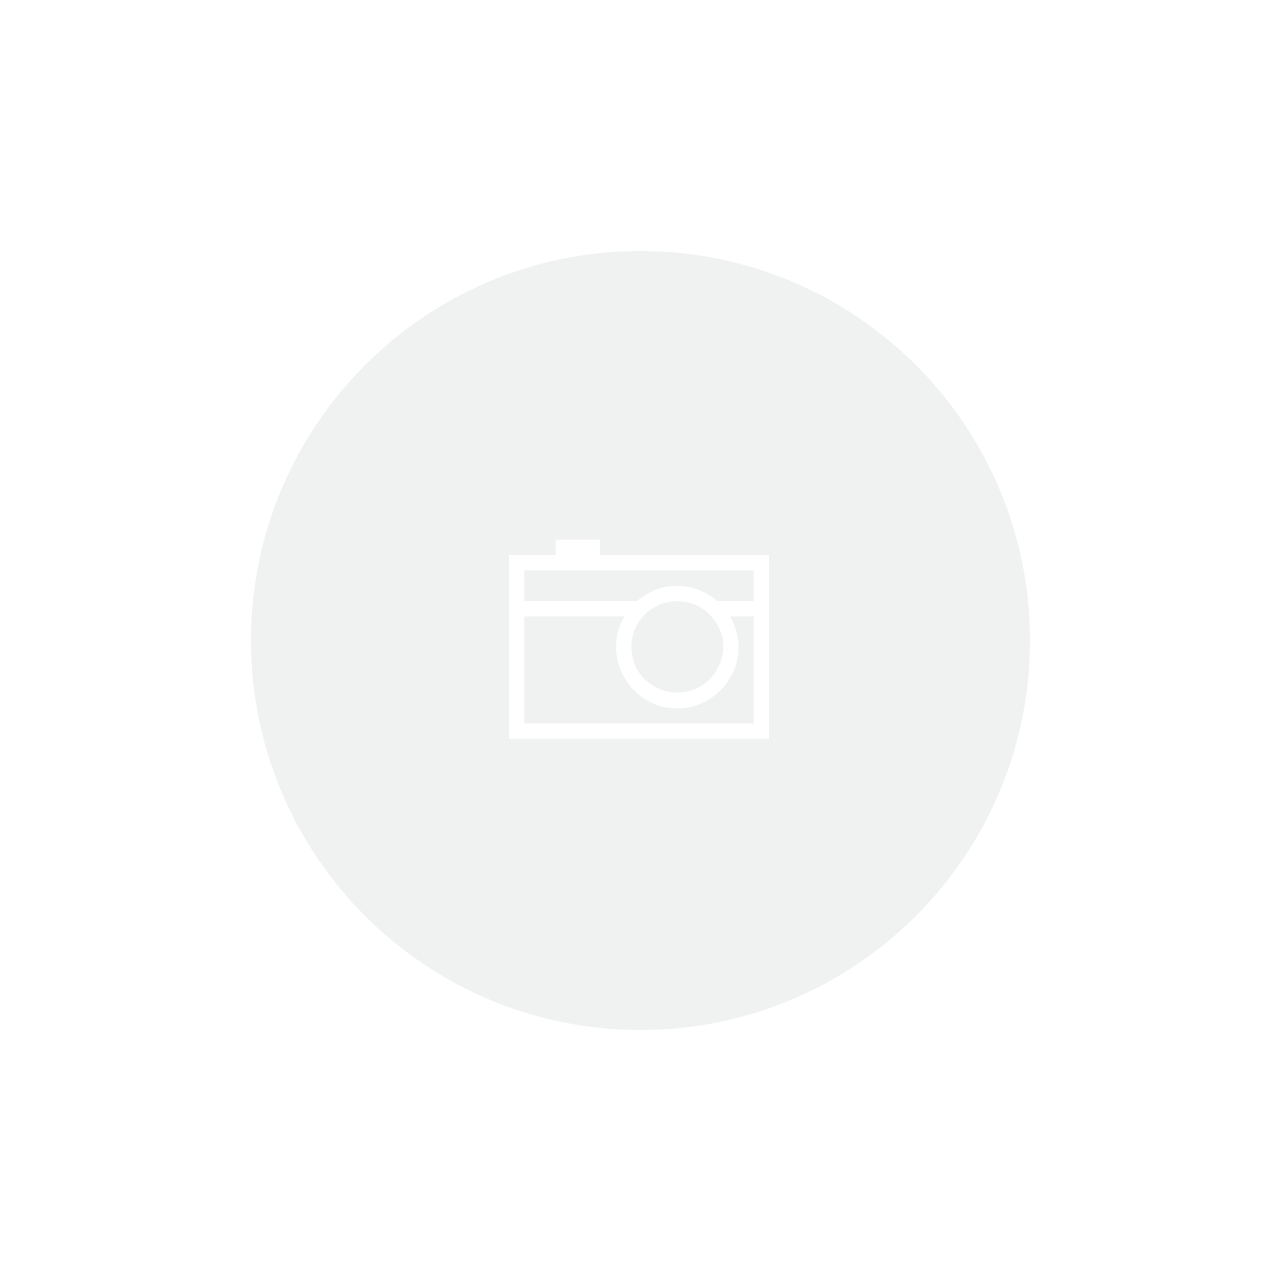 BICICLETA 29 BMC TEAMELITE 03 TWO 2019 11V SRAM NX